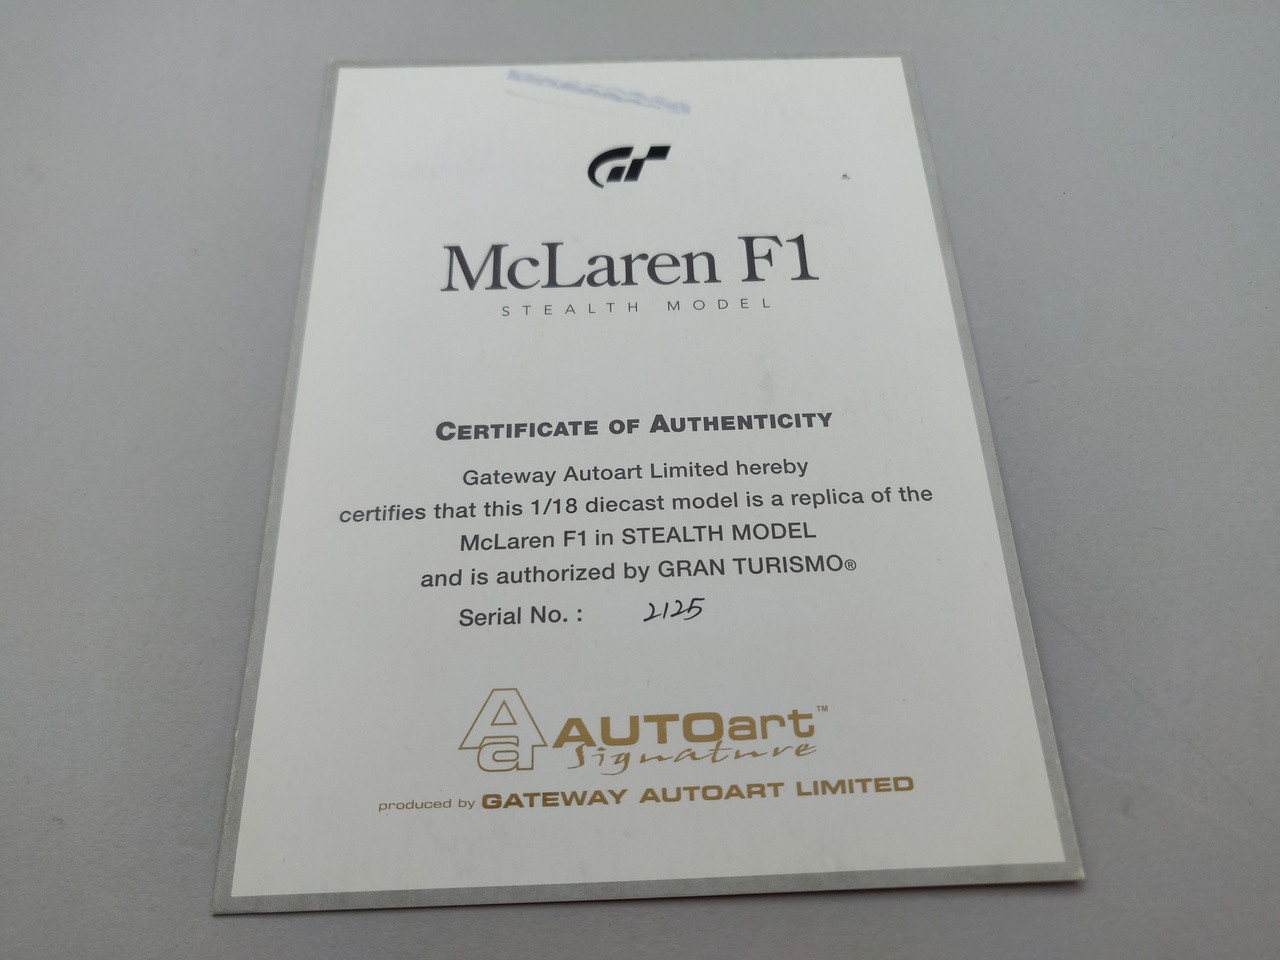 McLaren F1 Carbon Gran Turismo Black - Certificate